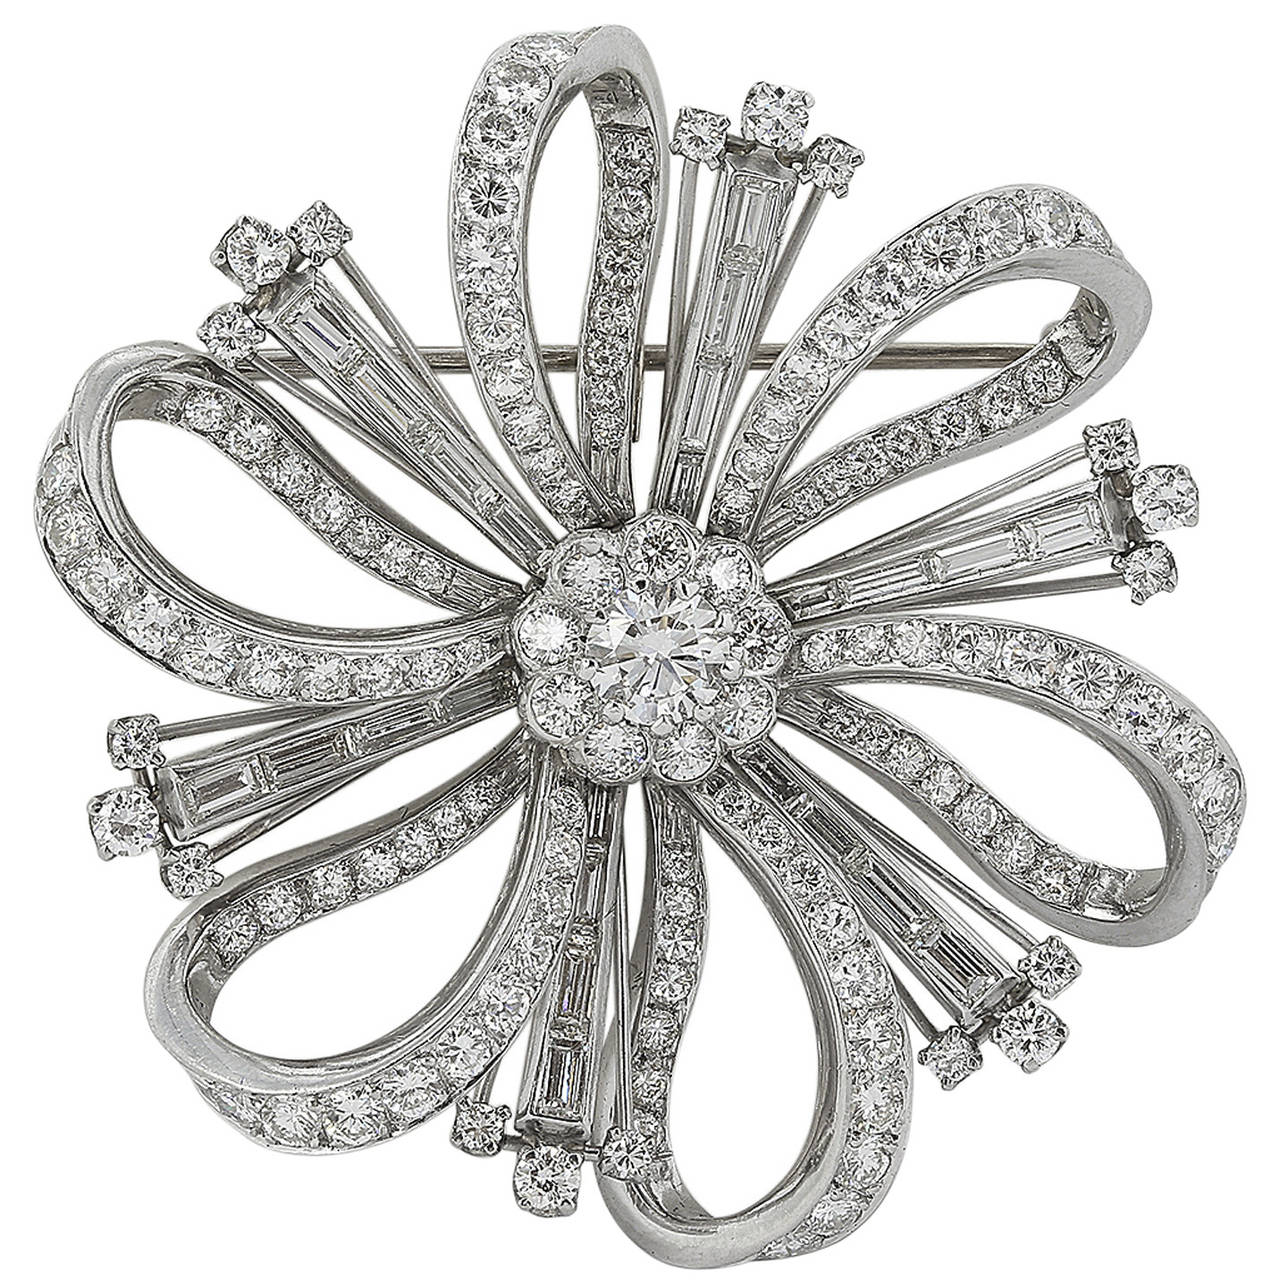 7.25 Carat Diamond Platinum Brooch or Pendant